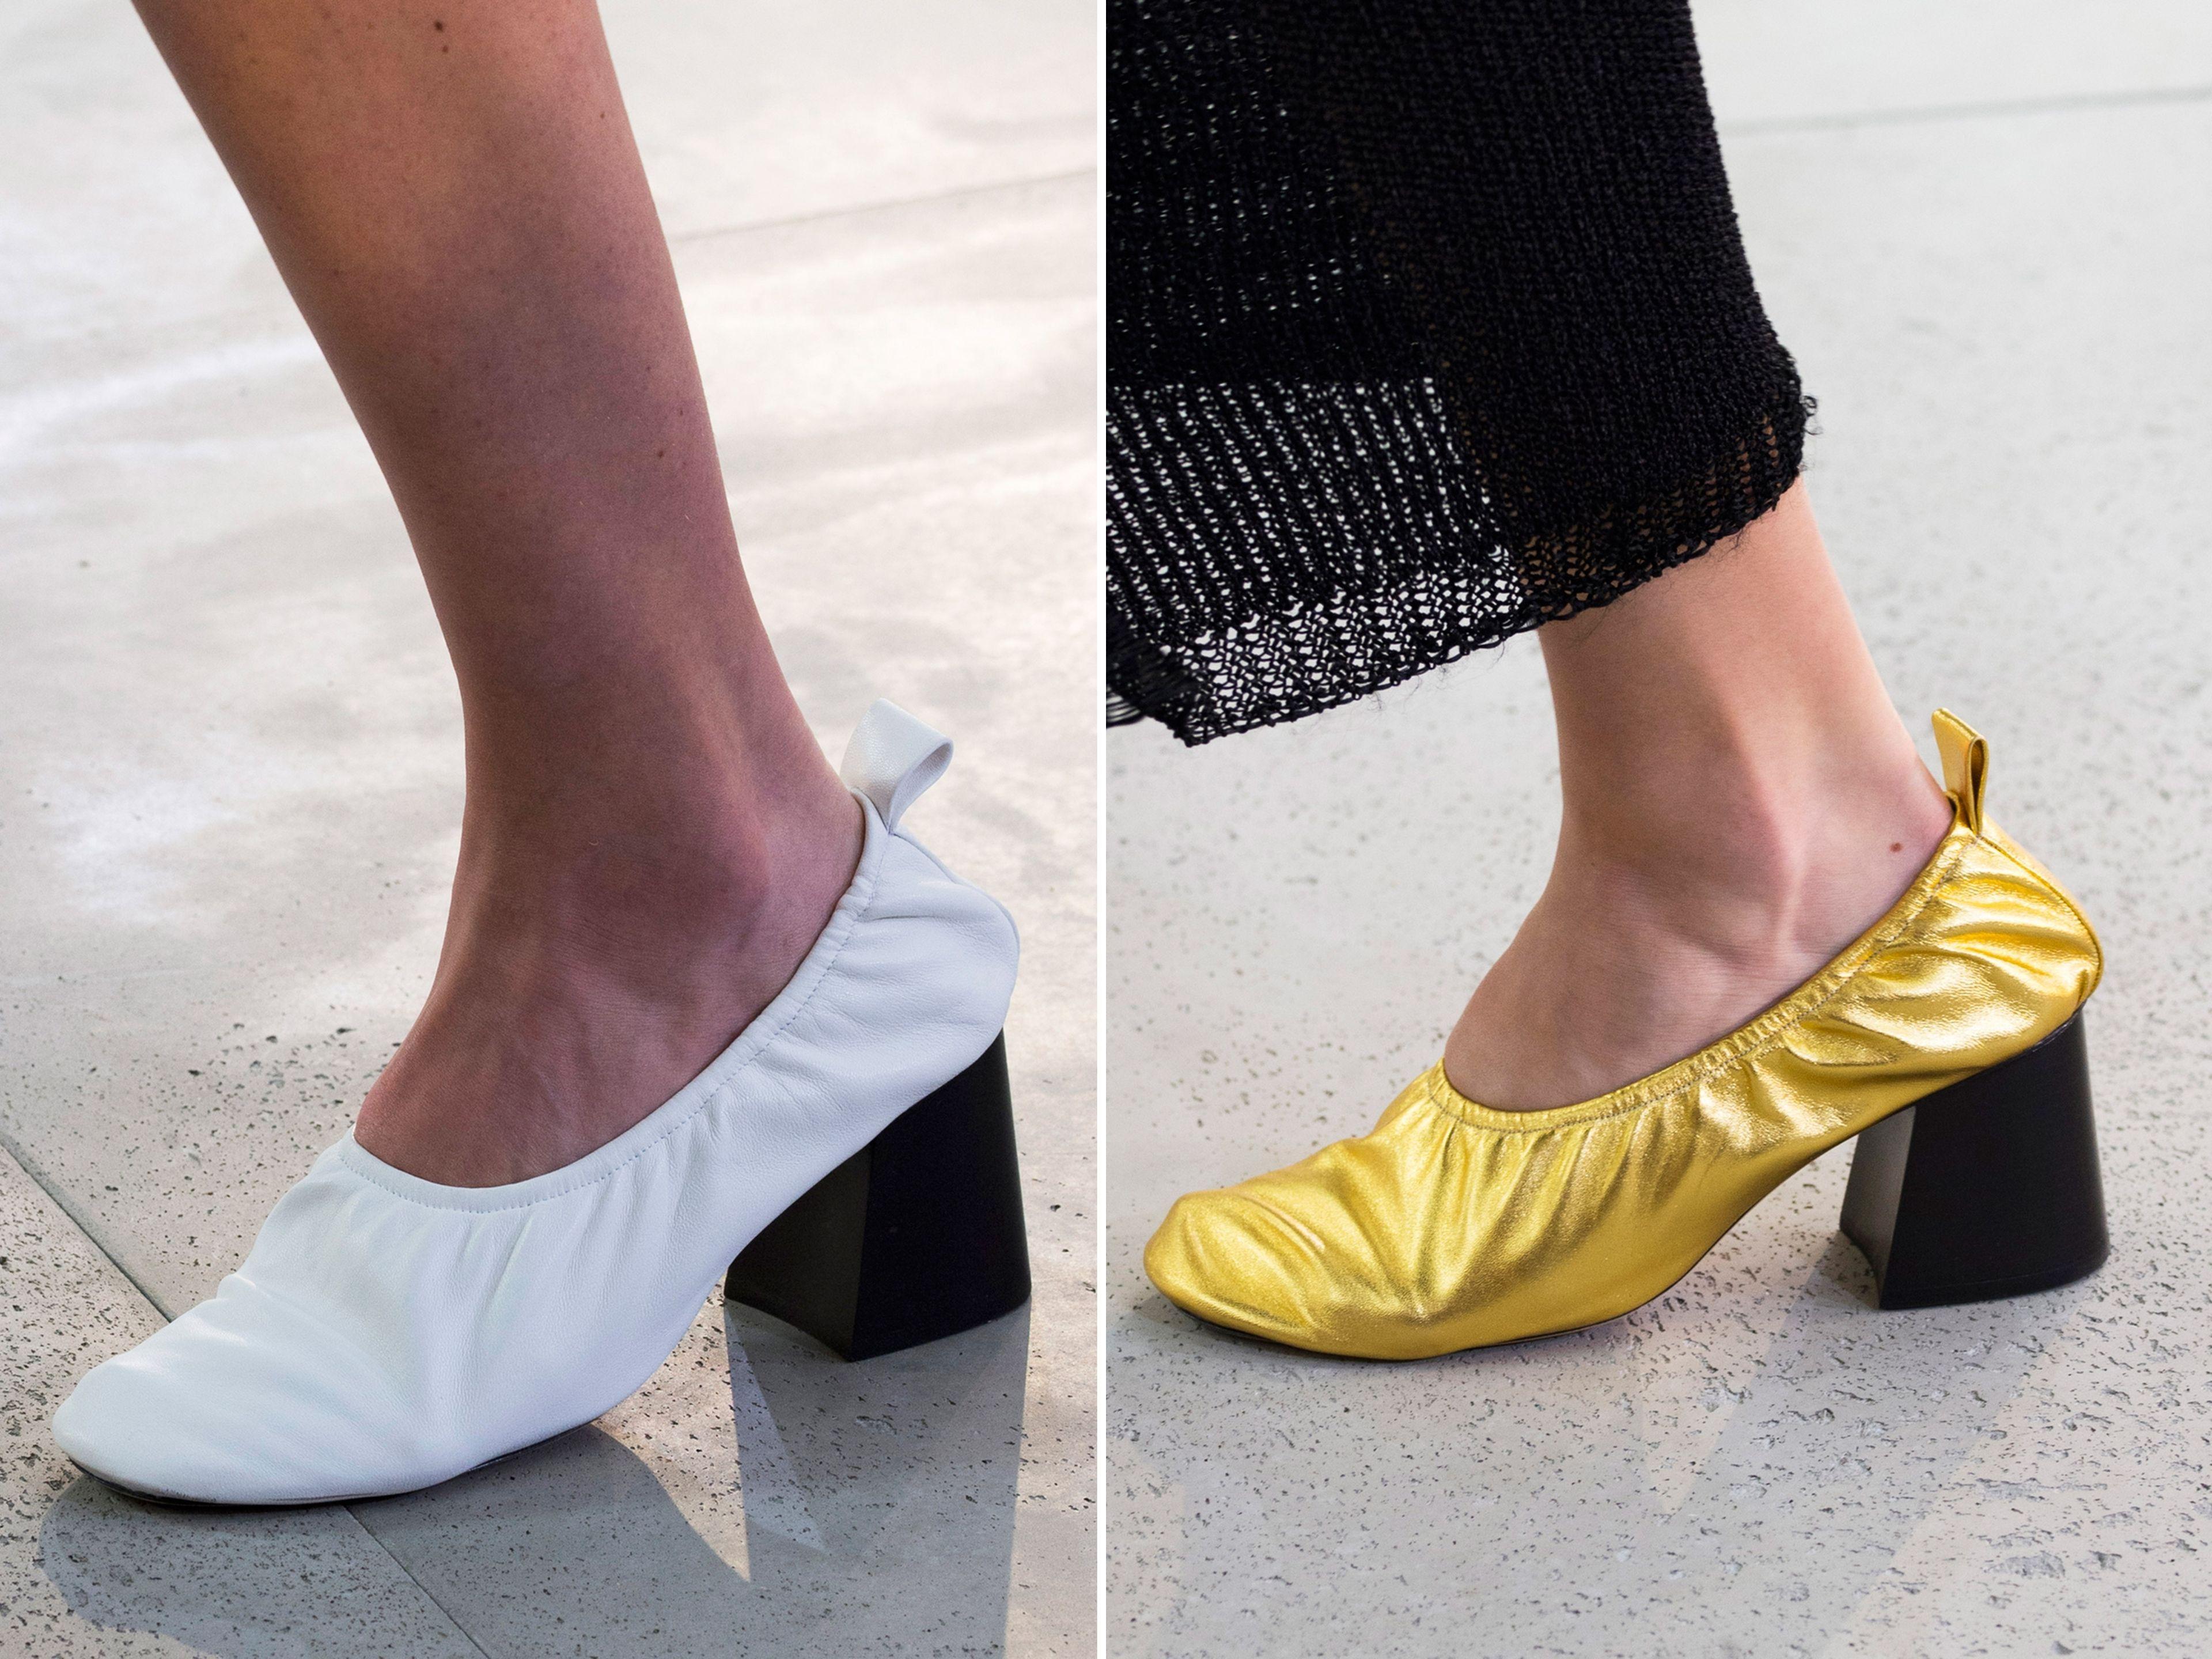 Celine glove shoe